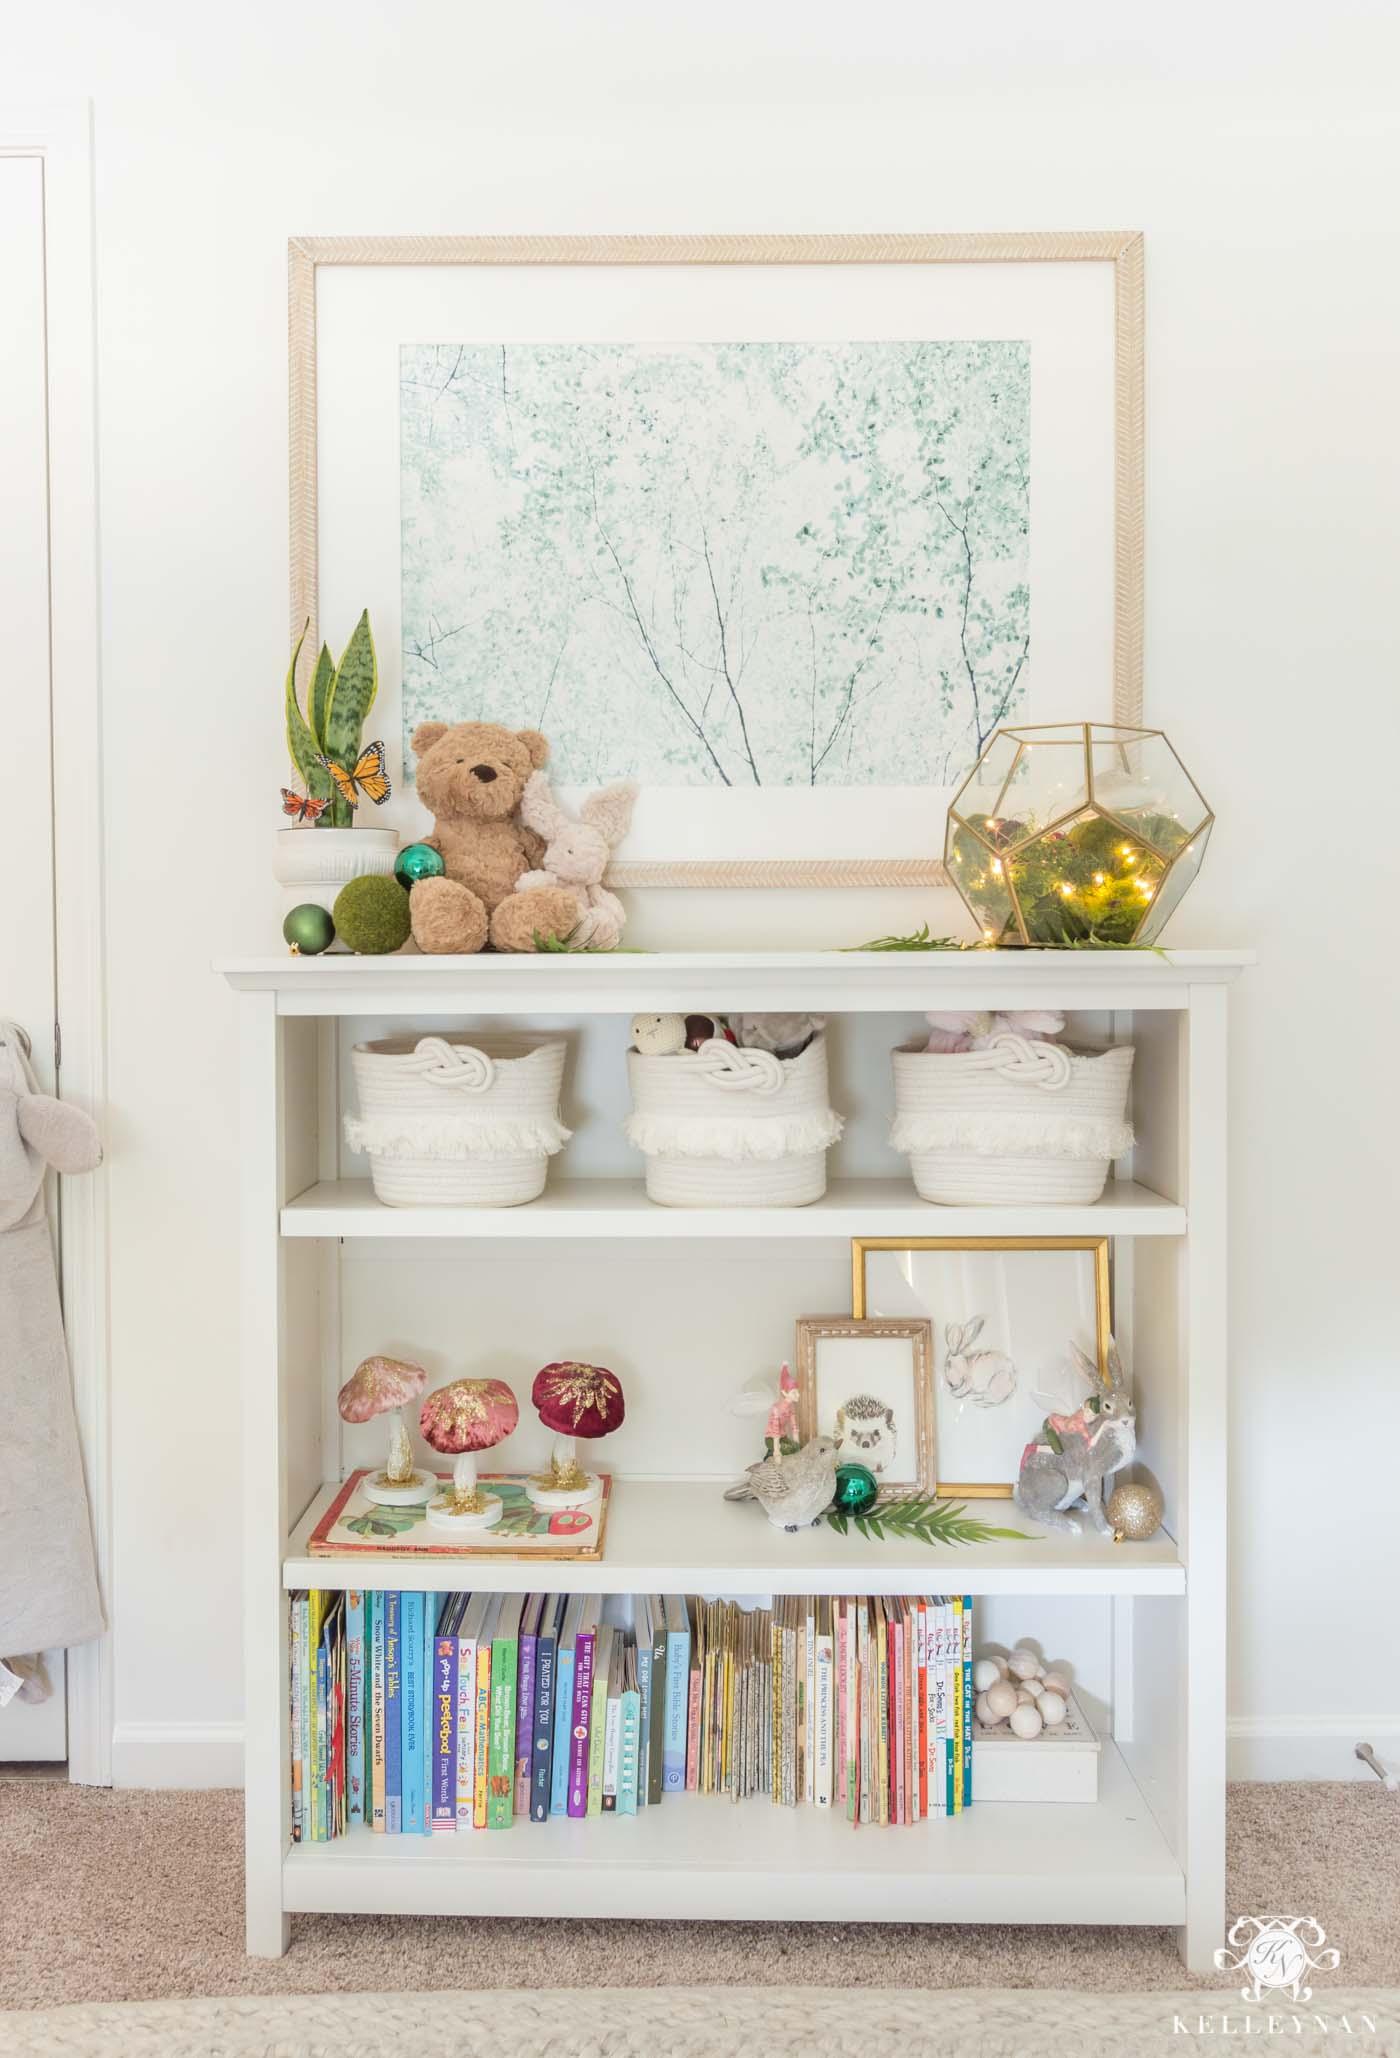 Baby Nursery Bookshelf Decor for Christmas